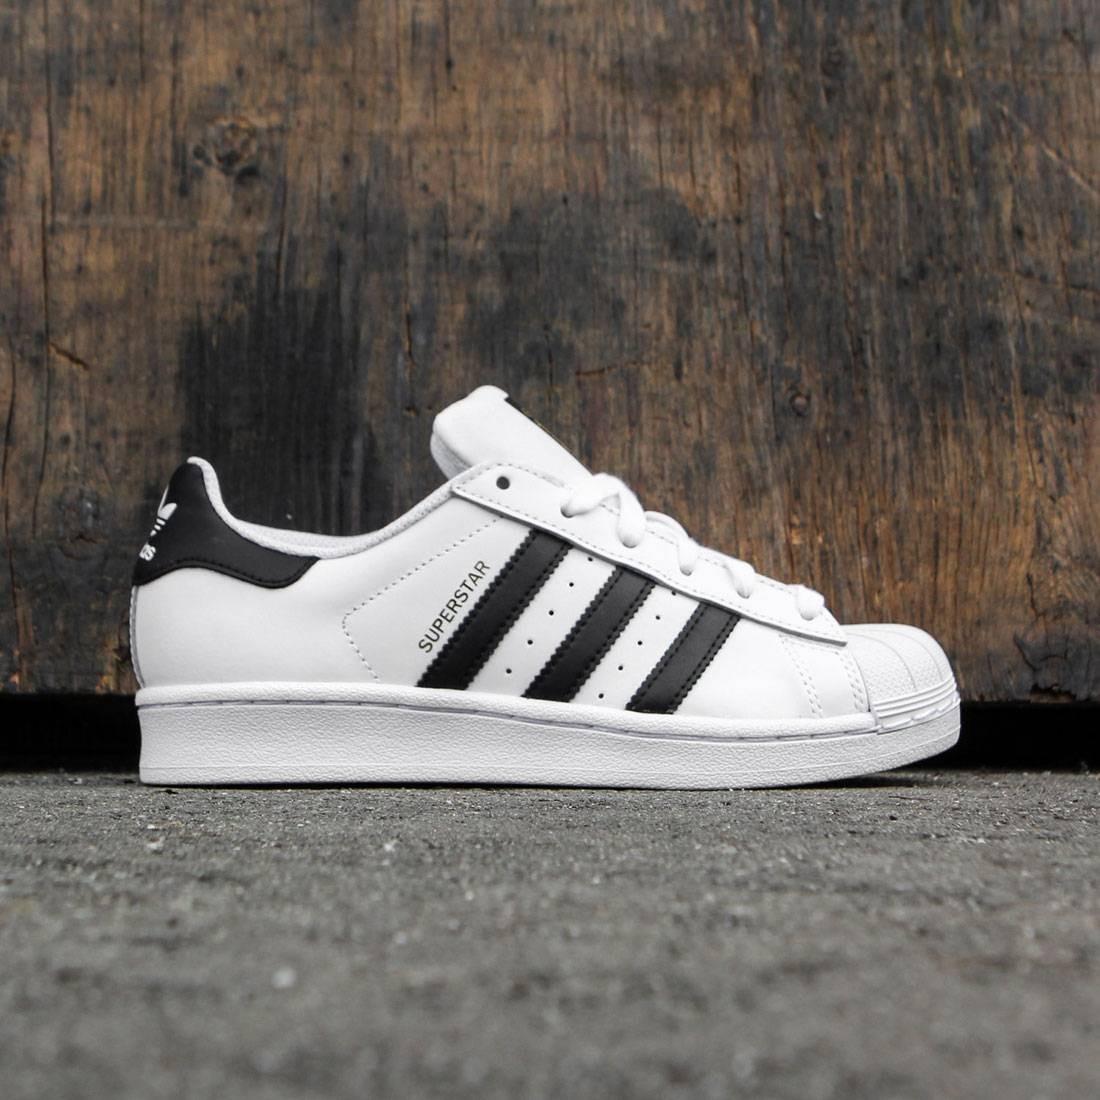 Adidas Big Kids Superstar (white / core black / running white ftw)